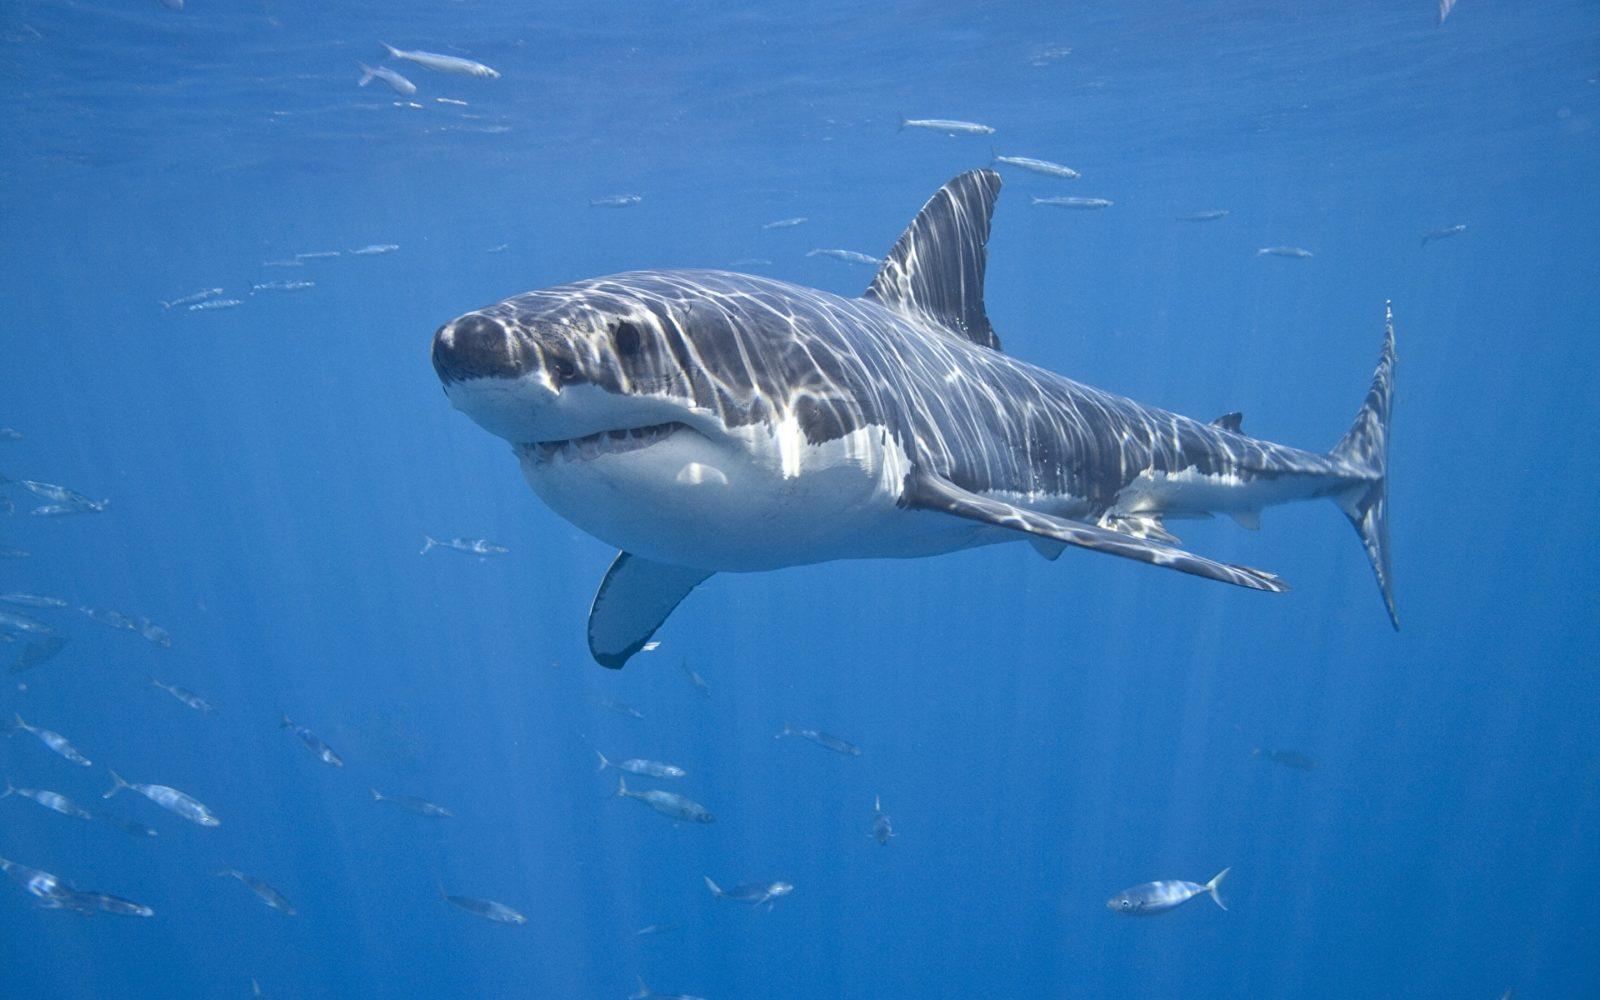 Sharks Underwater world 465073 1920x1200 - Интересные факты об акулах